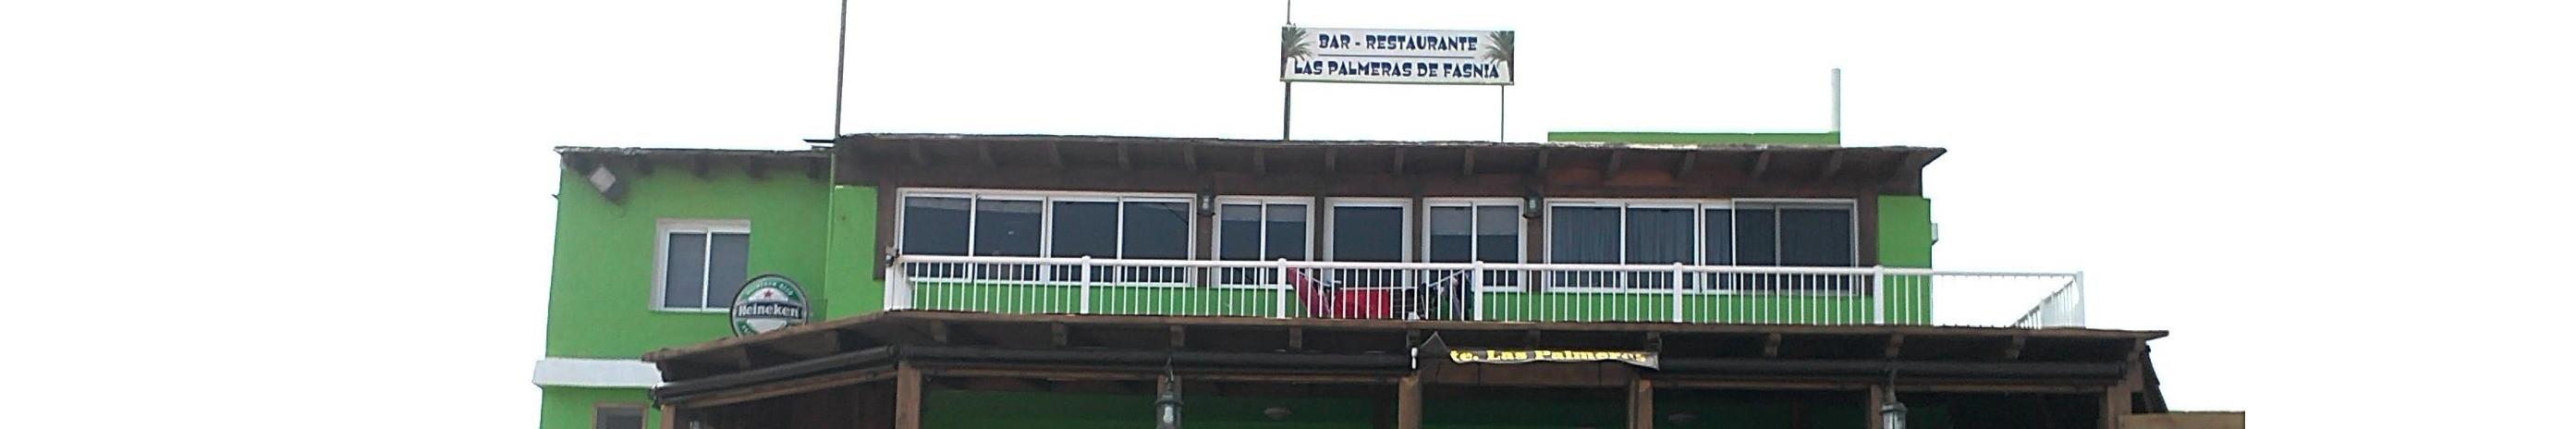 Restaurante las palmeras de fasnia